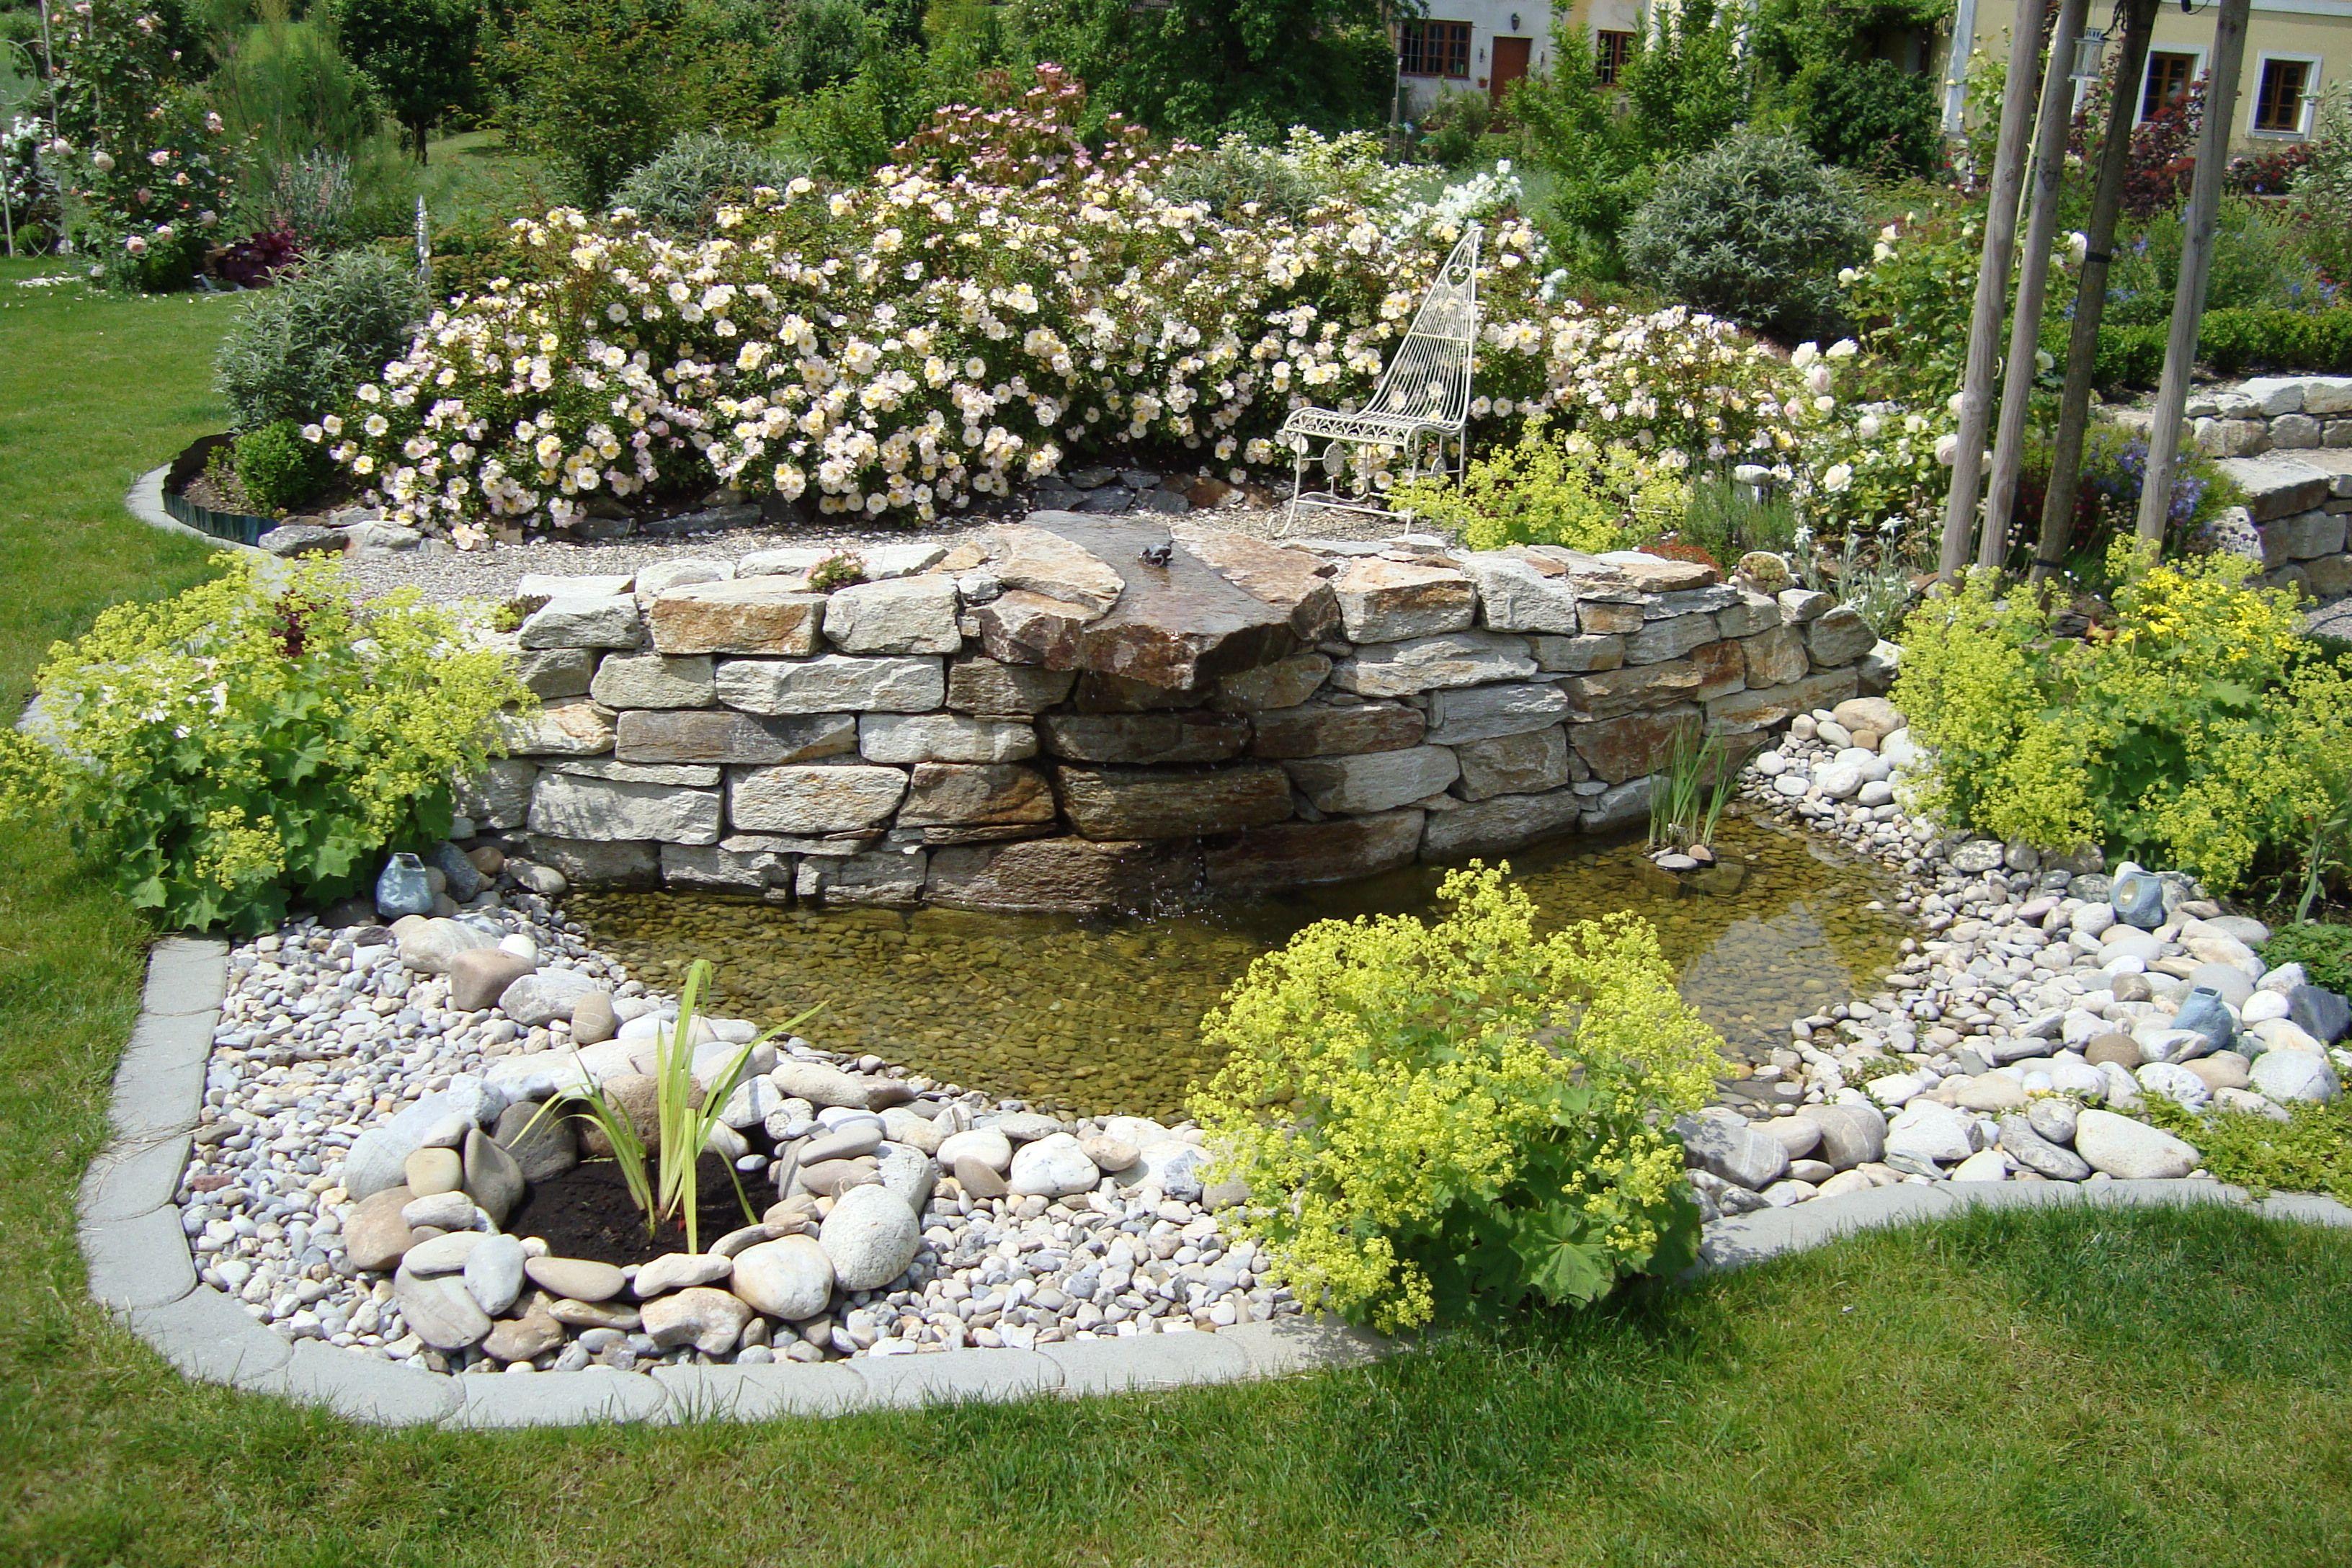 Luxus Garten Am Hang Ideen Schema